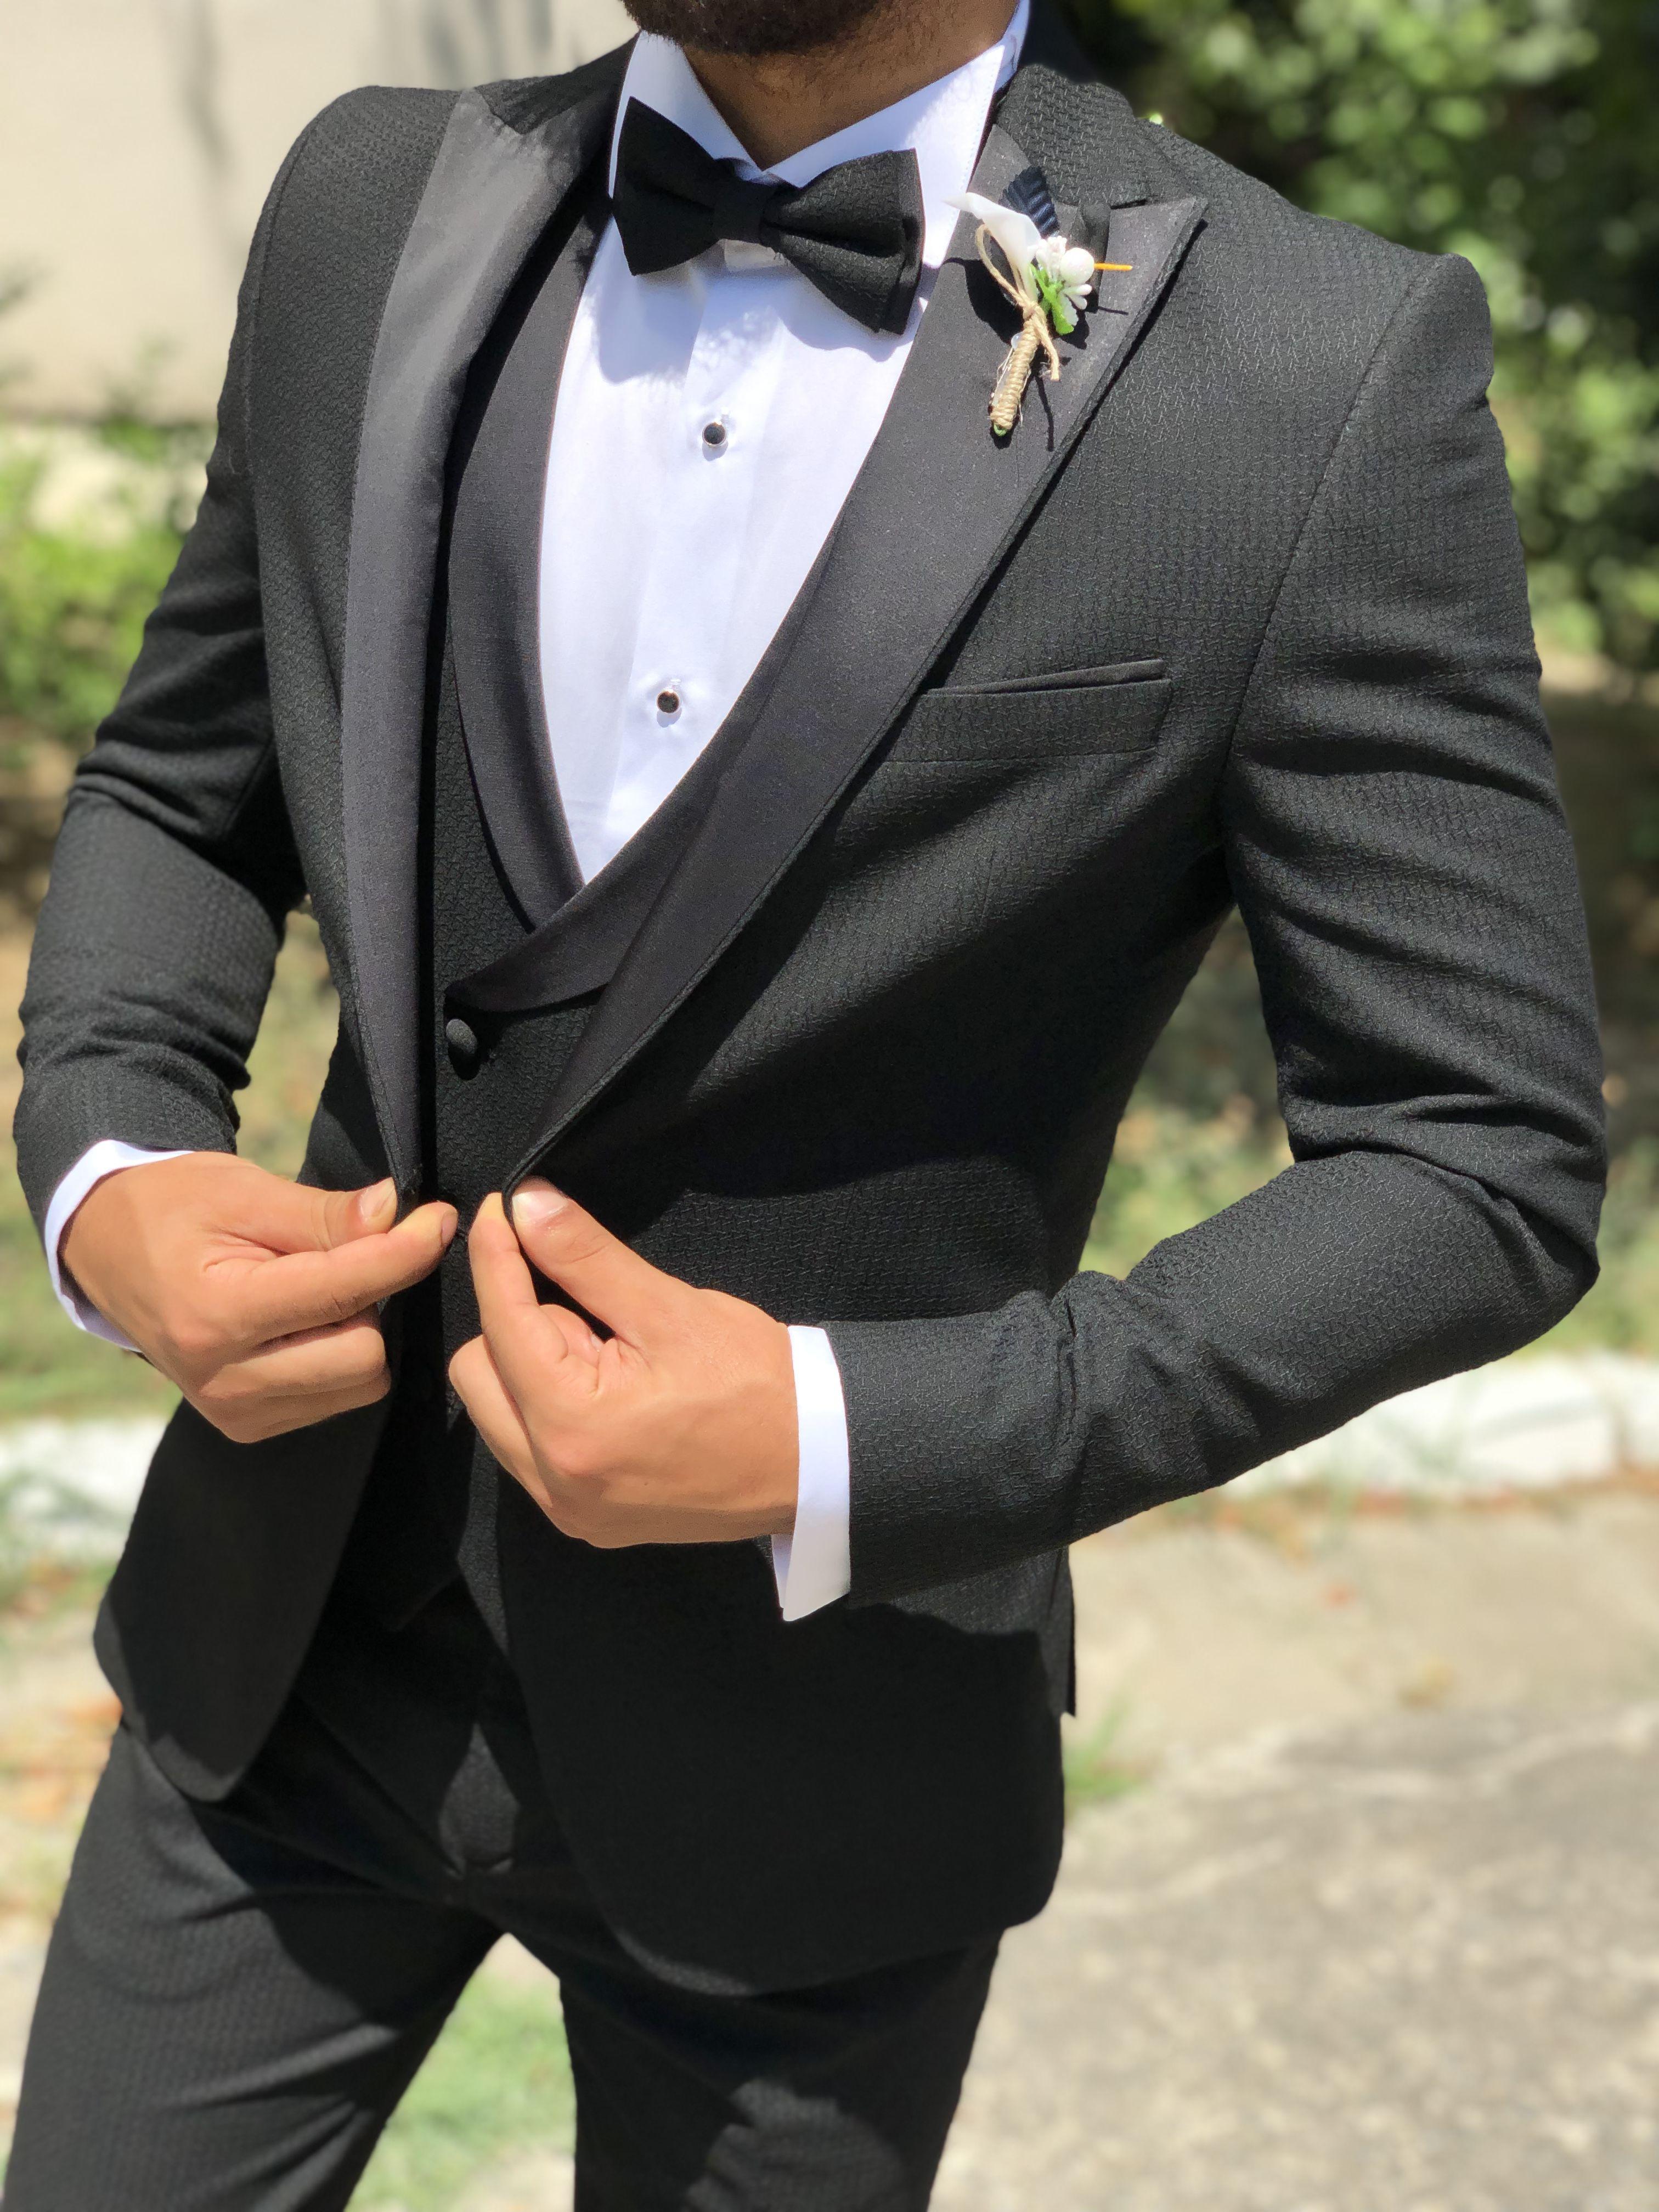 10 Ay Perakende Ve Toptan 10ay Erkekgiyim Instagram Photos And Videos Wedding Suits Men Grey Mens Fashion Classy Suits